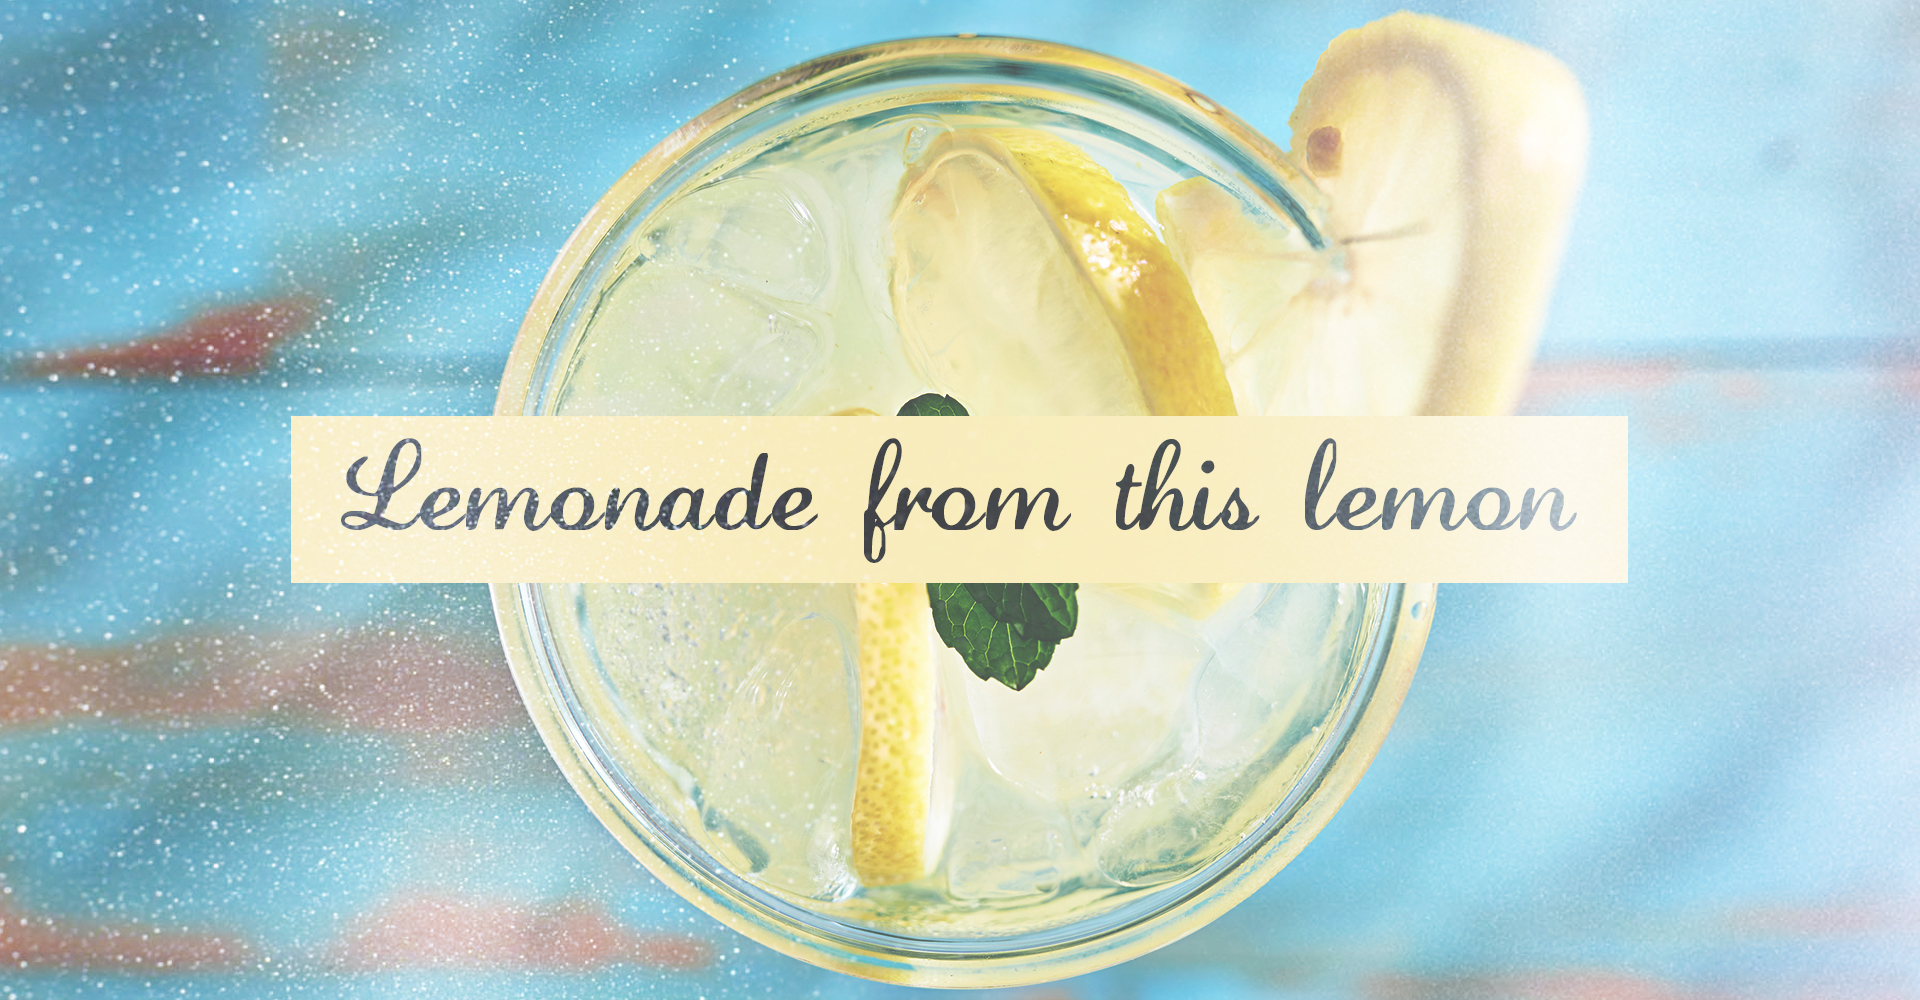 lemonade from this lemon